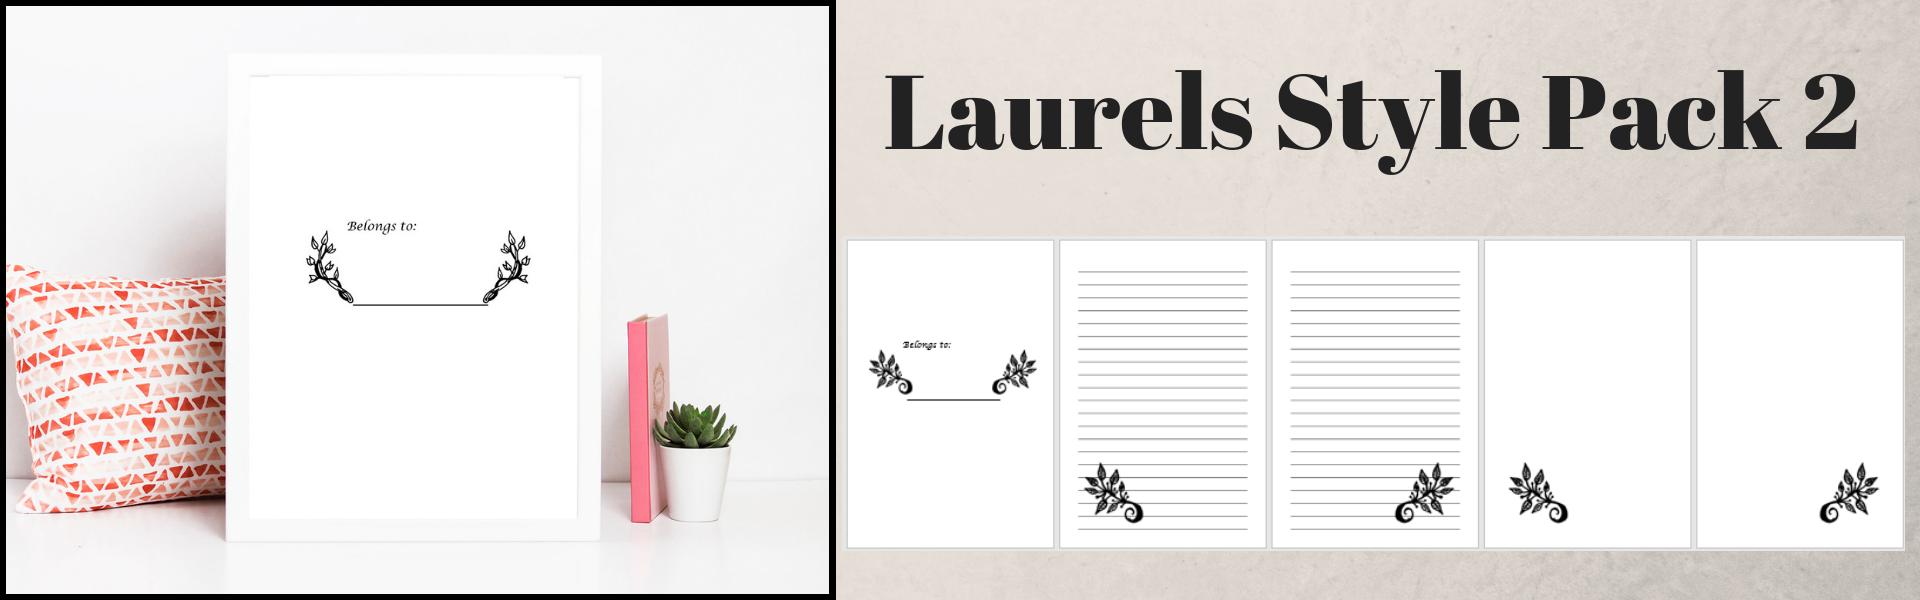 Laurels Style Pack 2